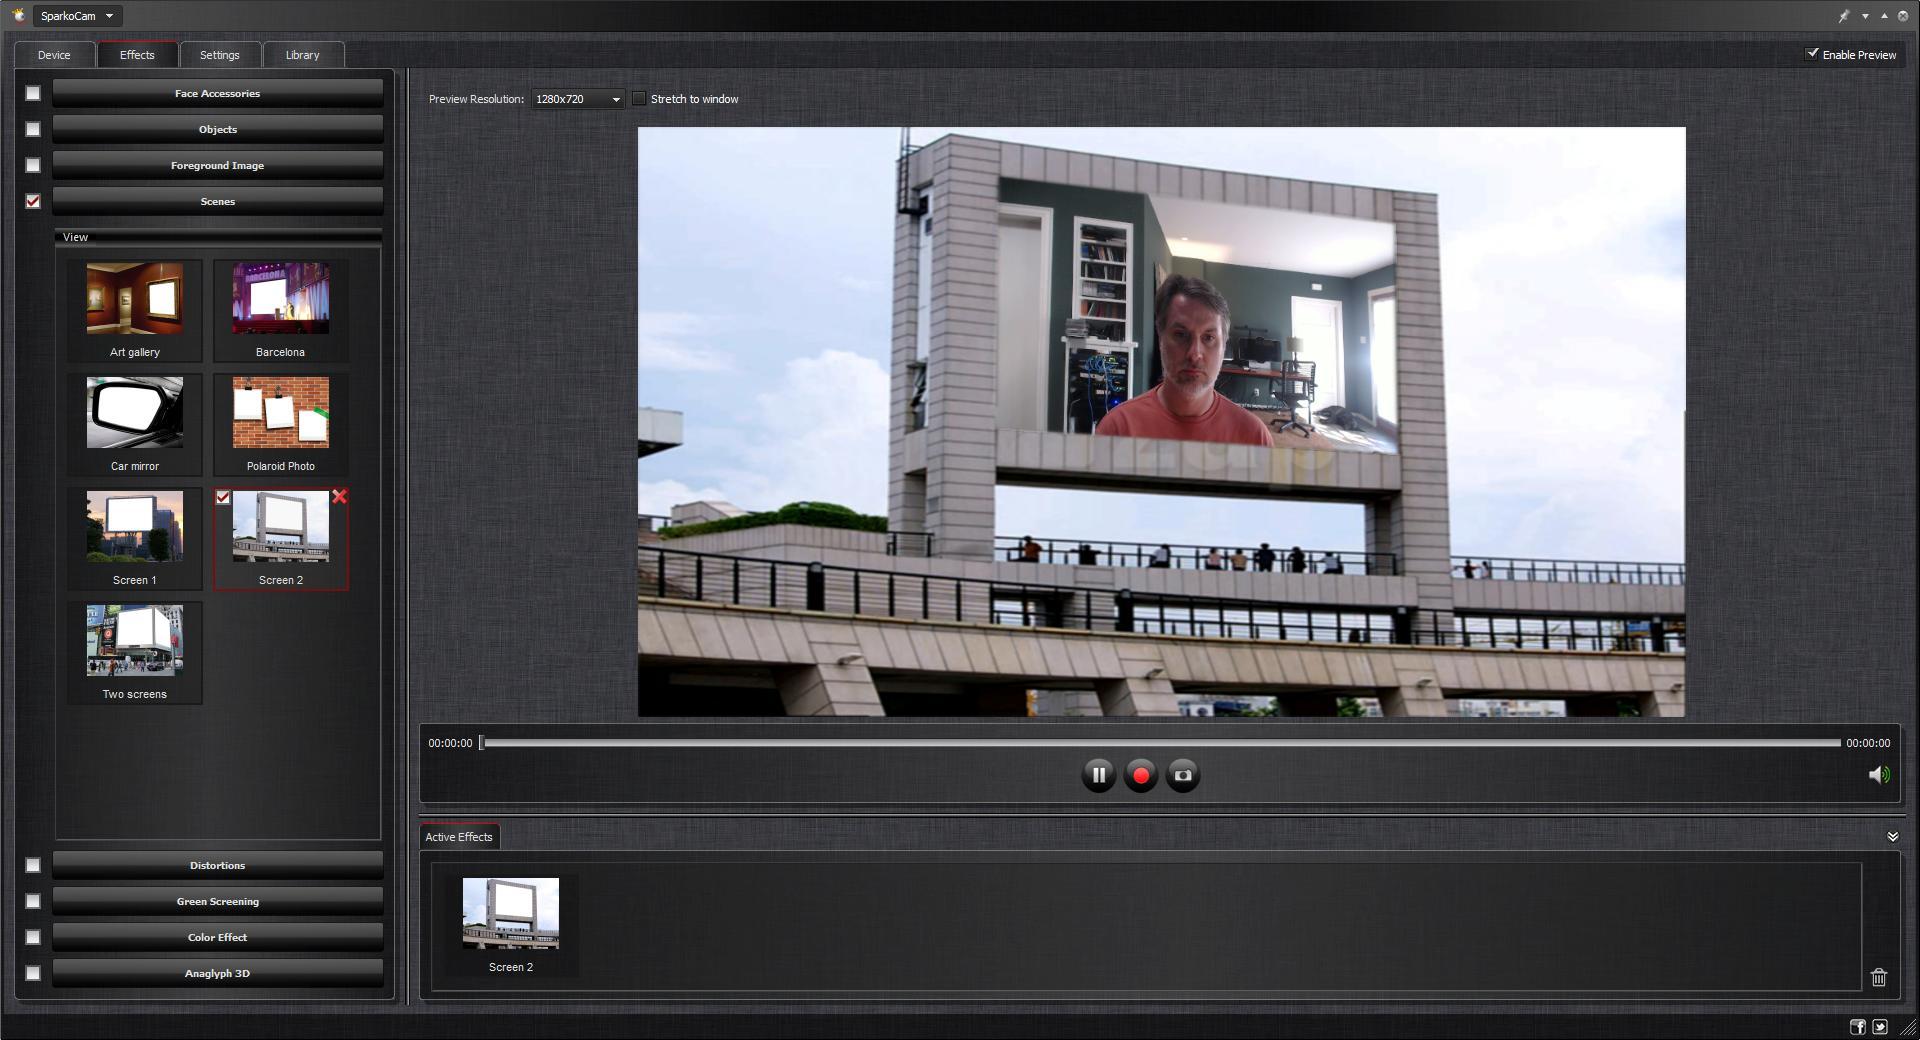 Webcams 5 Sparkocam Amp My Canon Rebel Xsi Graves On Soho